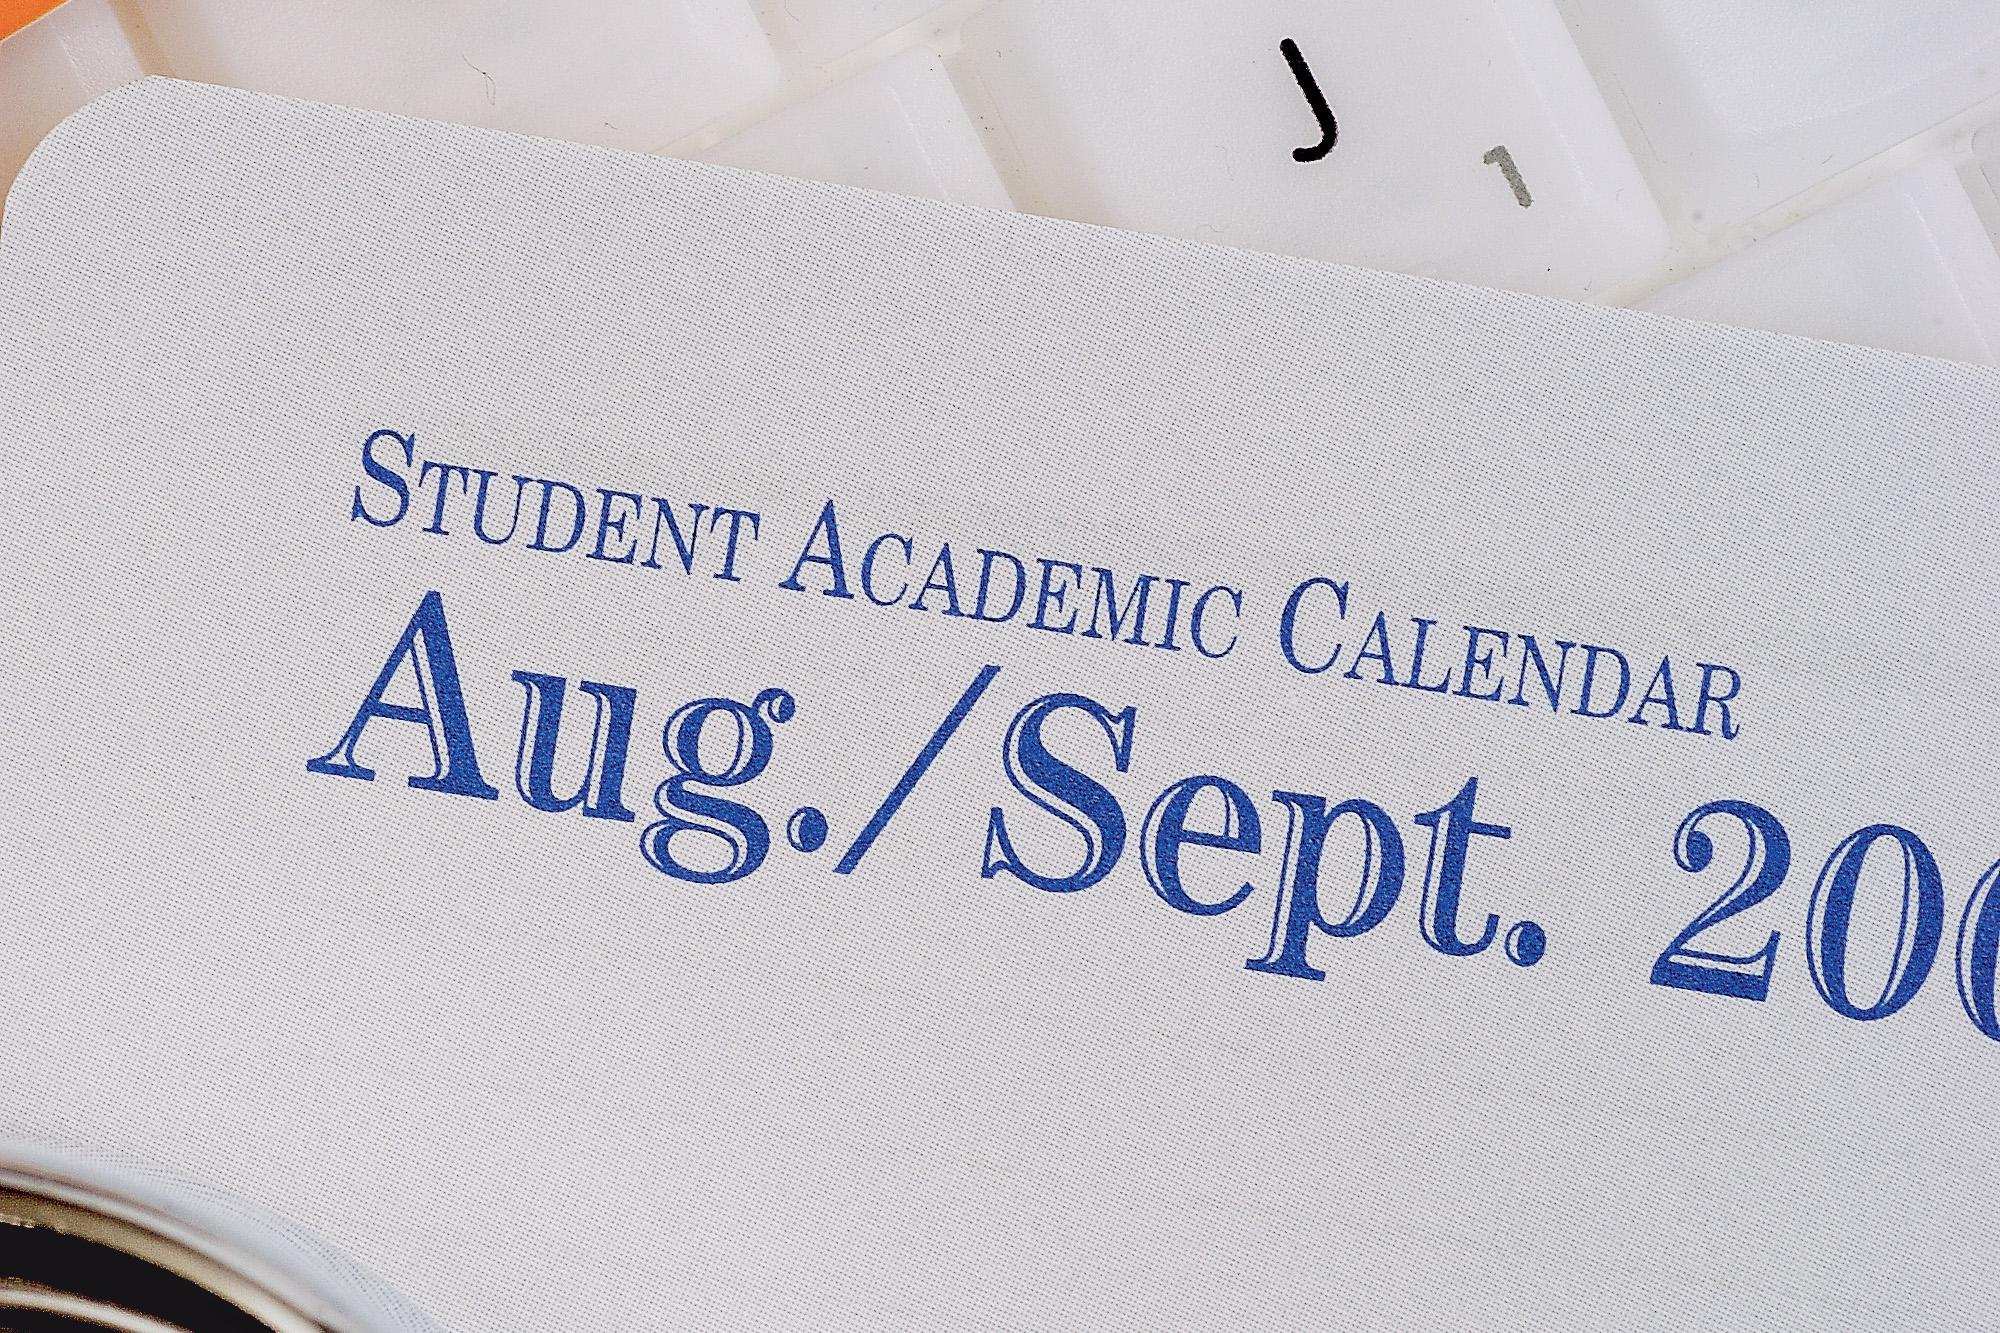 Board talks school calendar dates